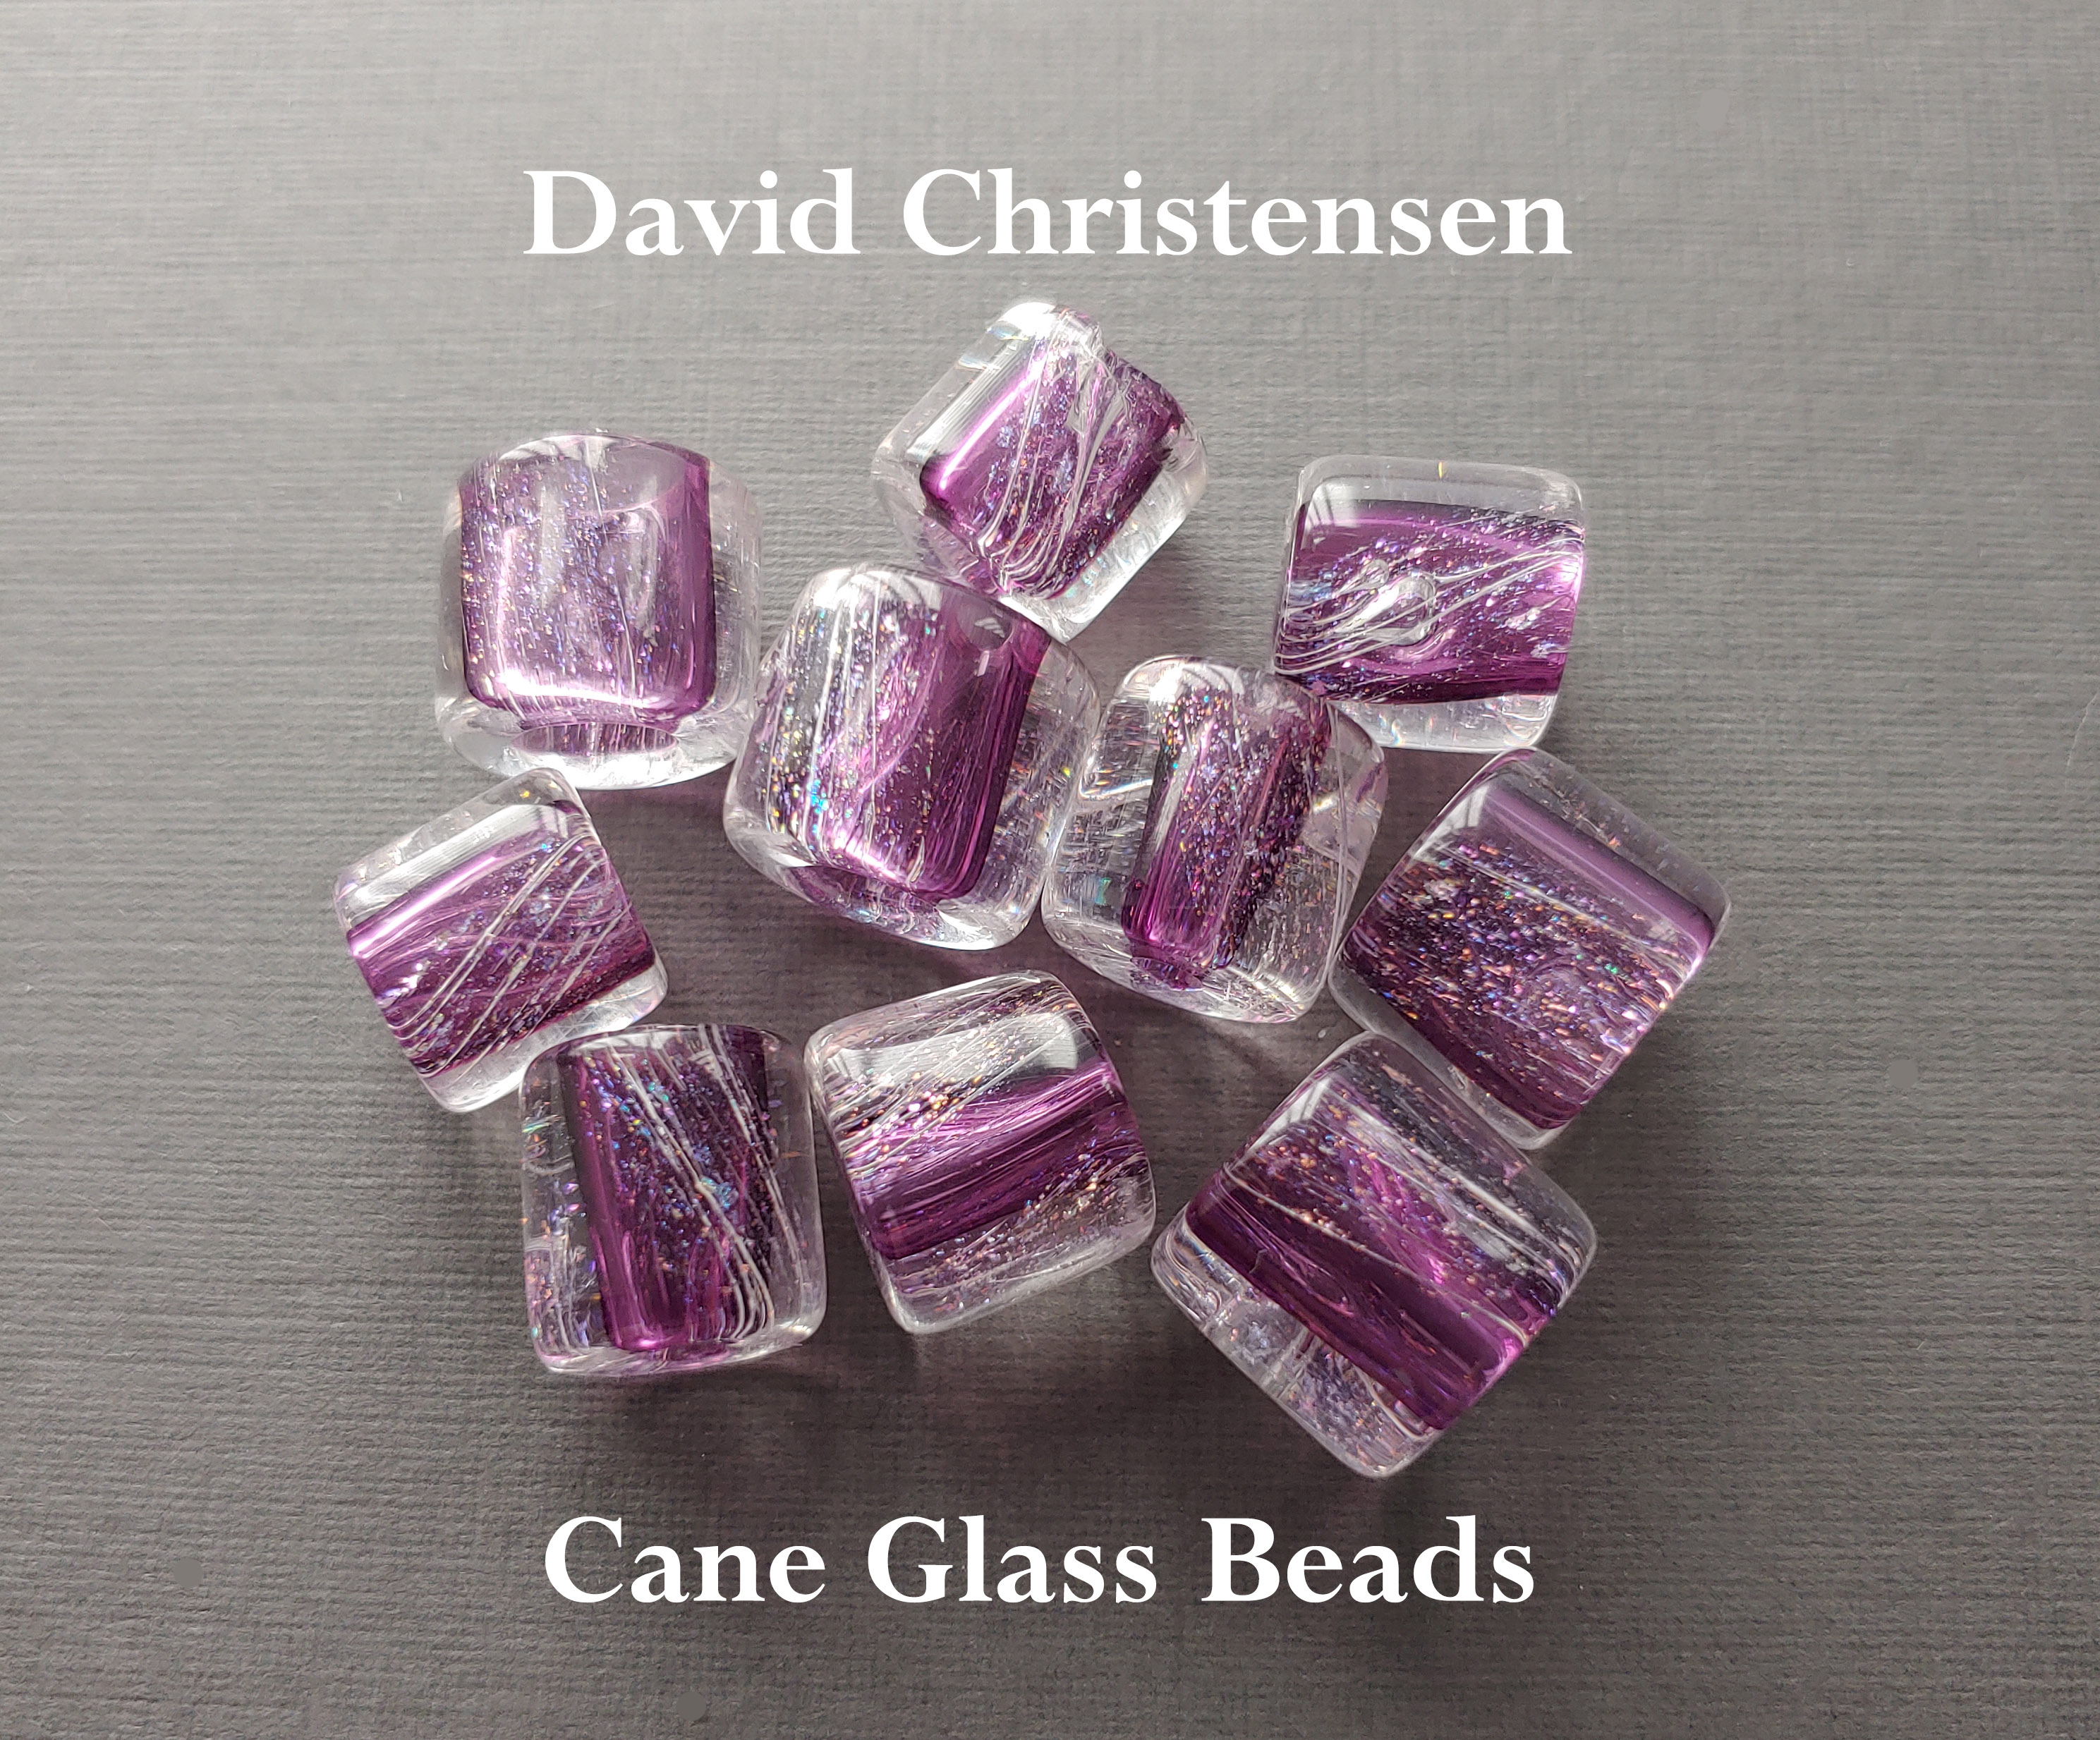 David Christensen Cane Glass Beads